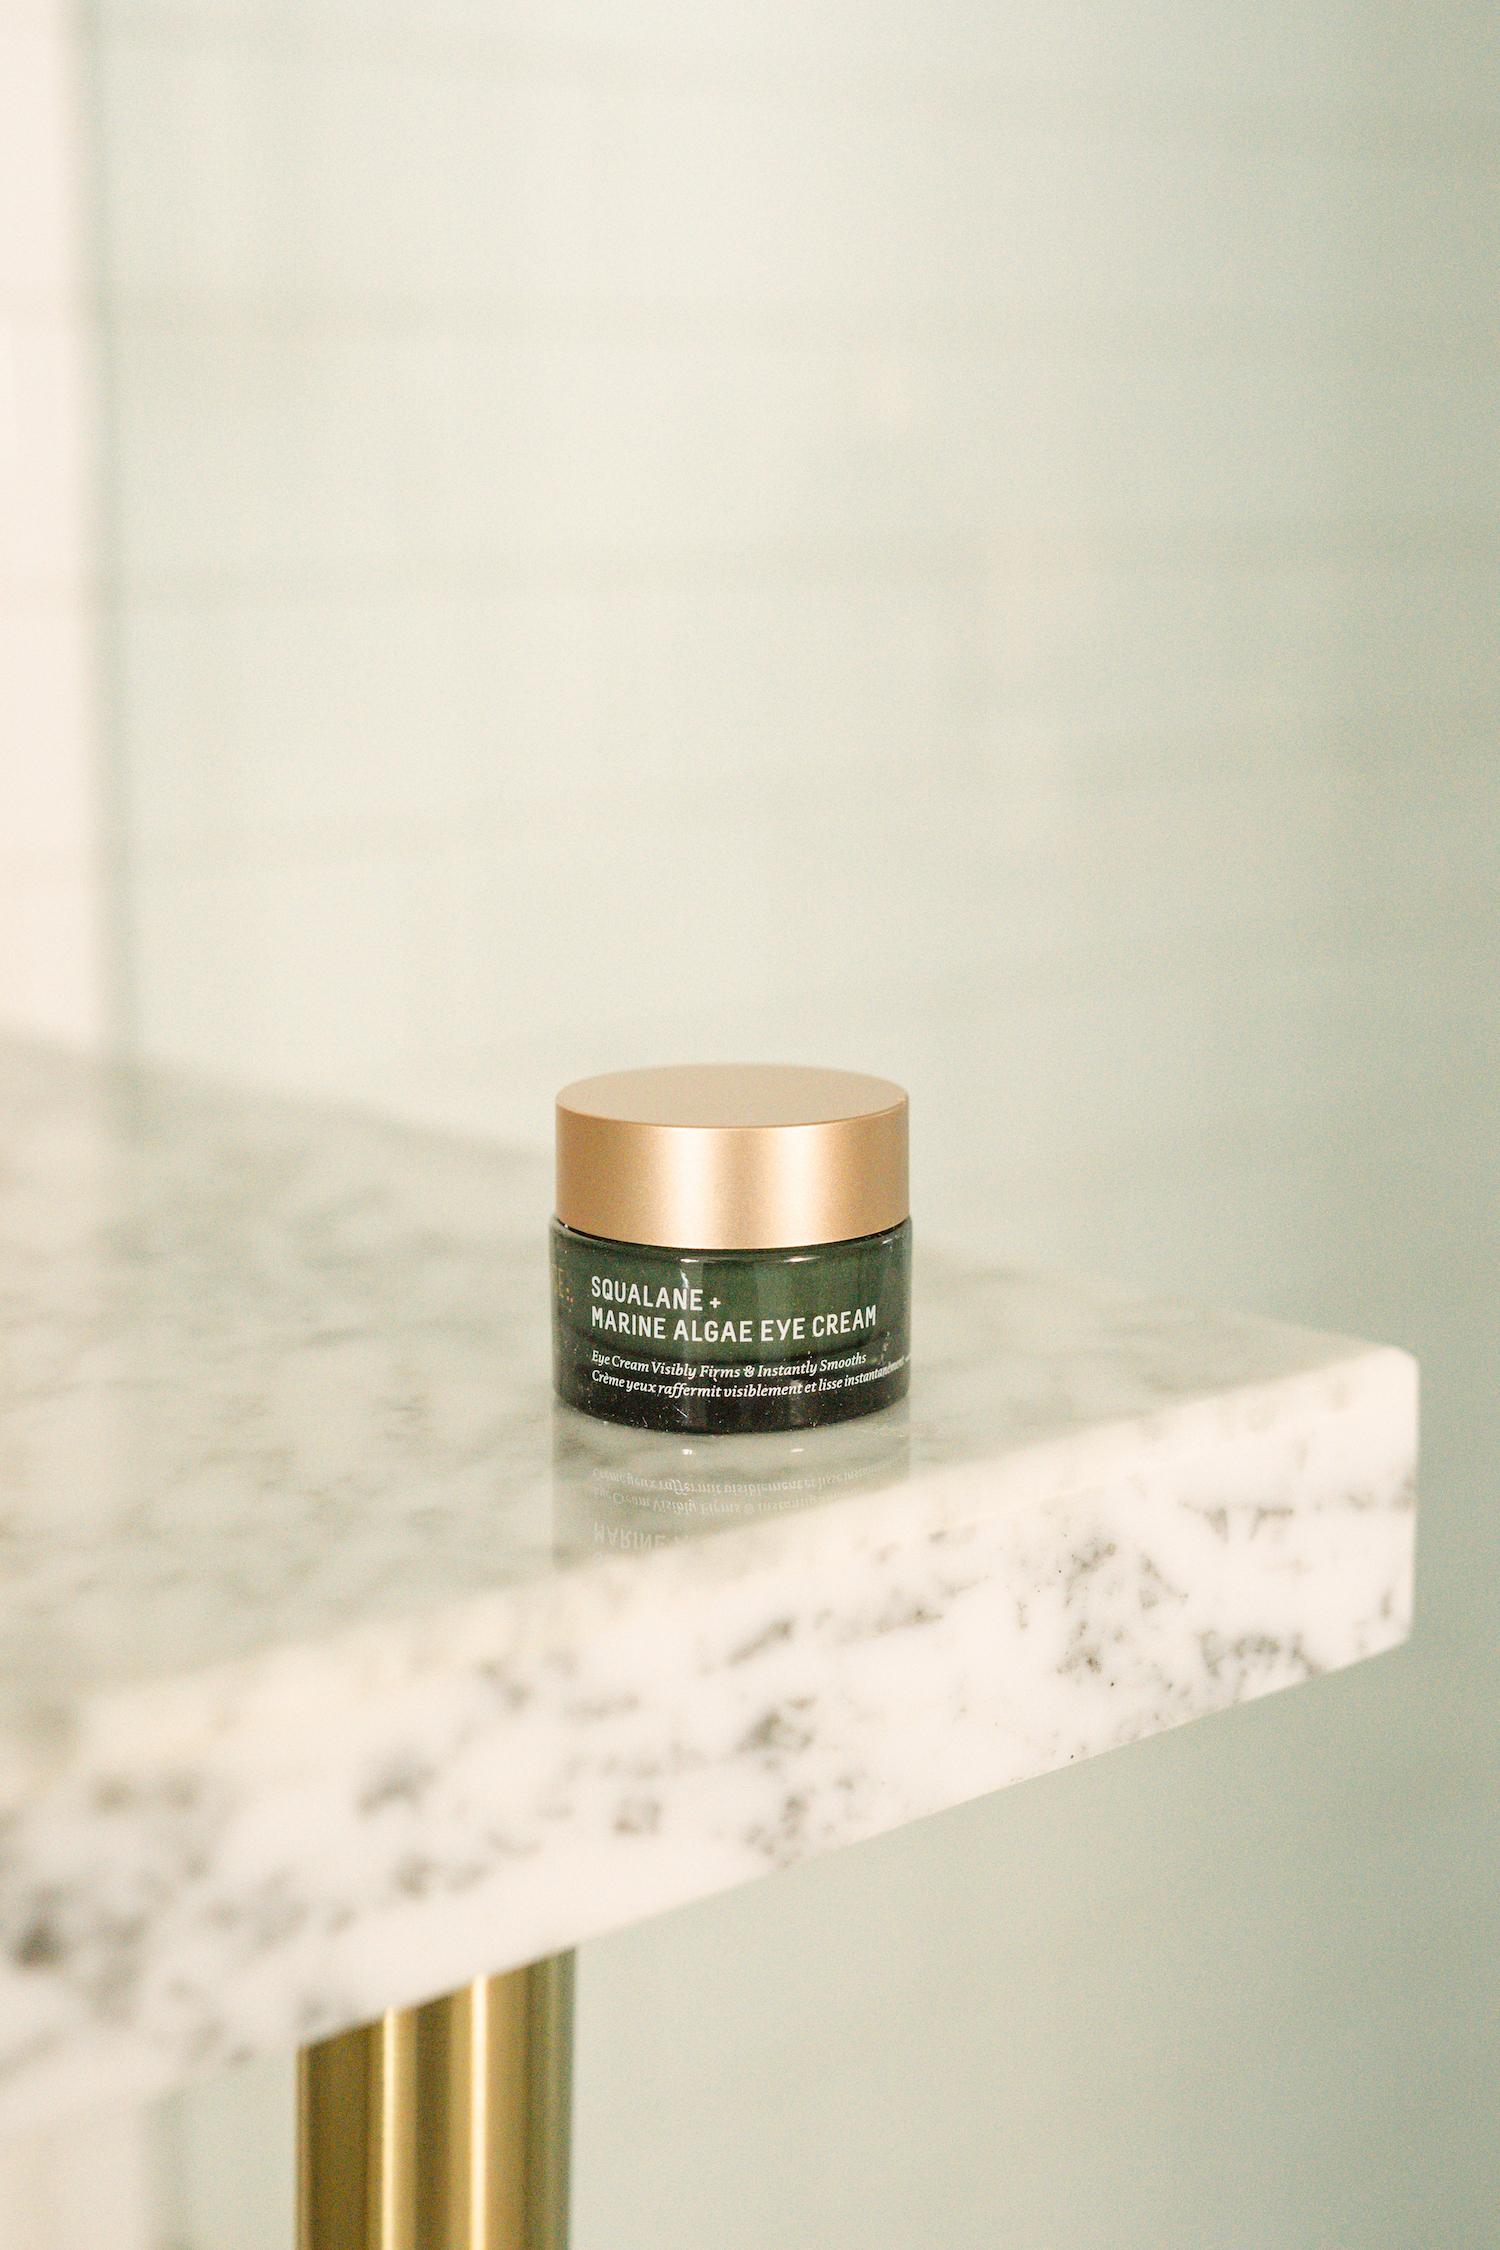 Squalane + Marine Algae Eye Cream | Biossance x Sephora Spring Savings Event